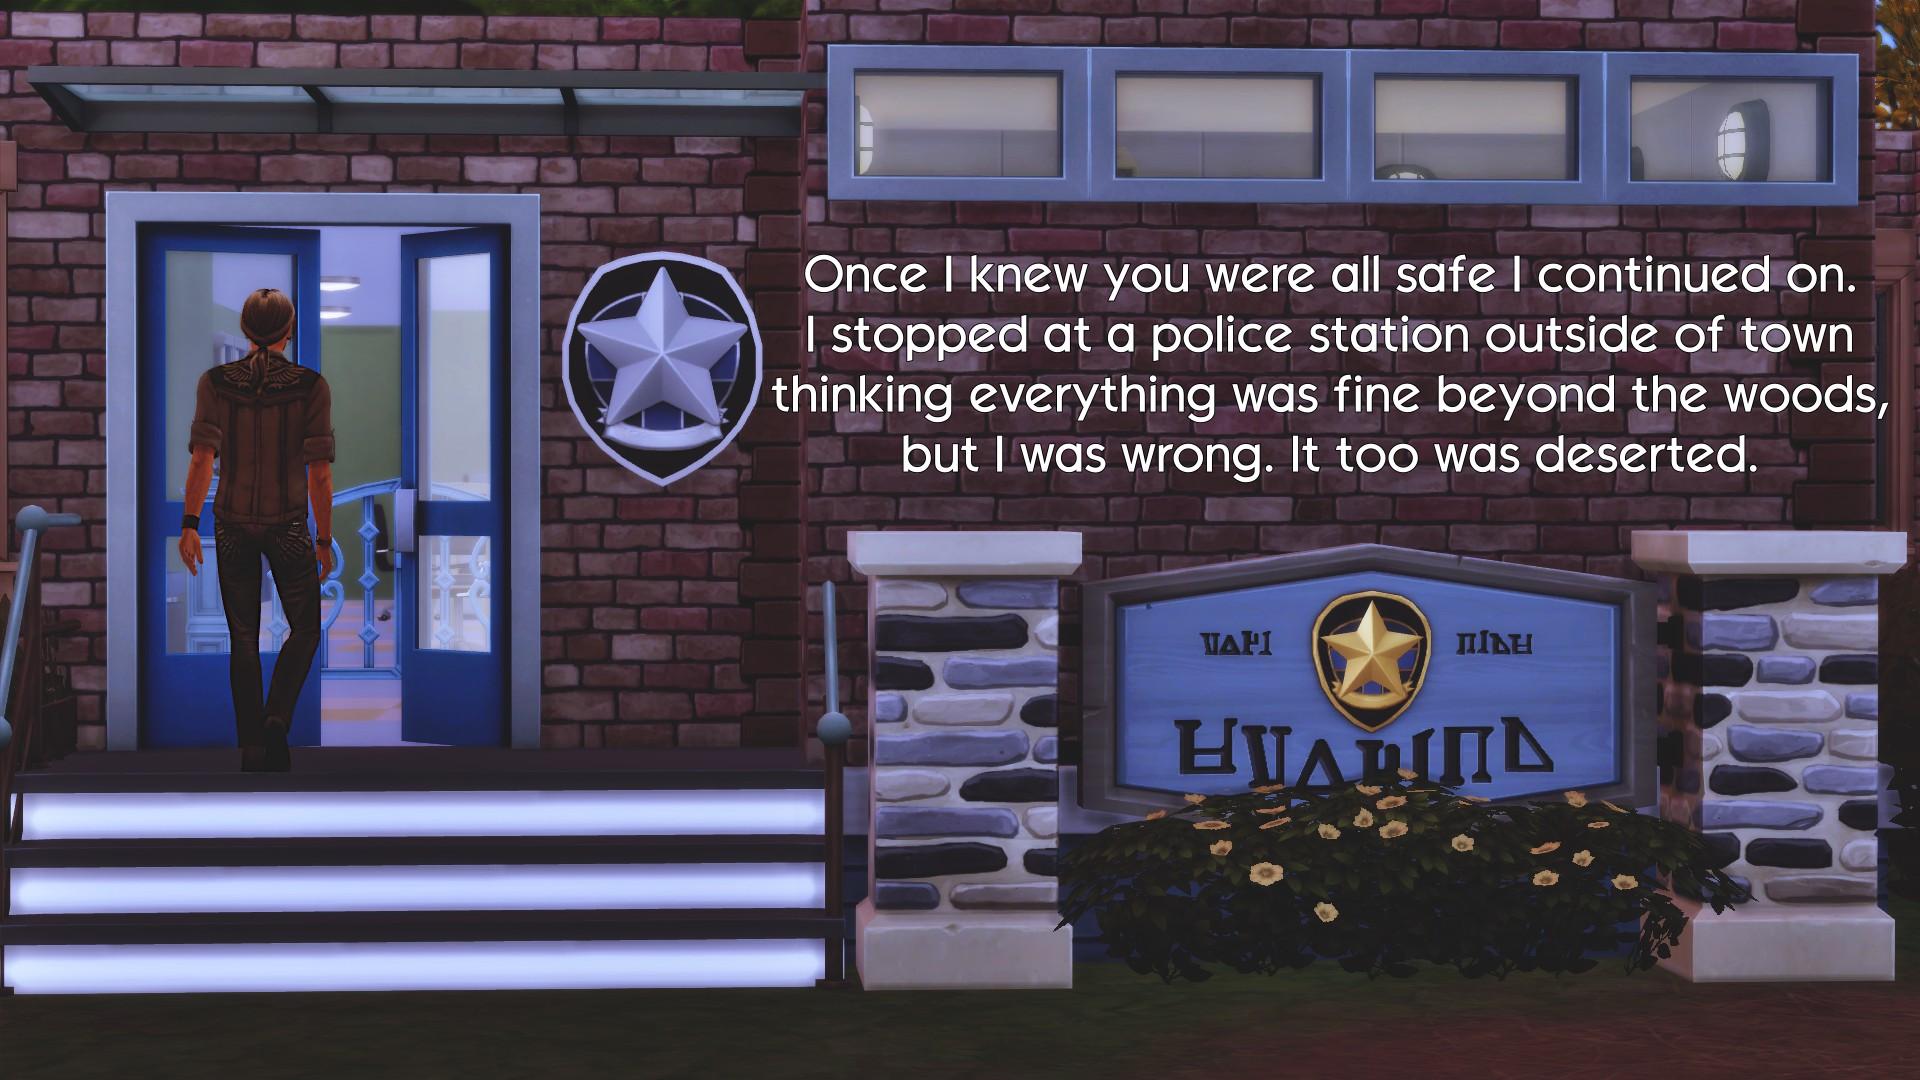 22 police station